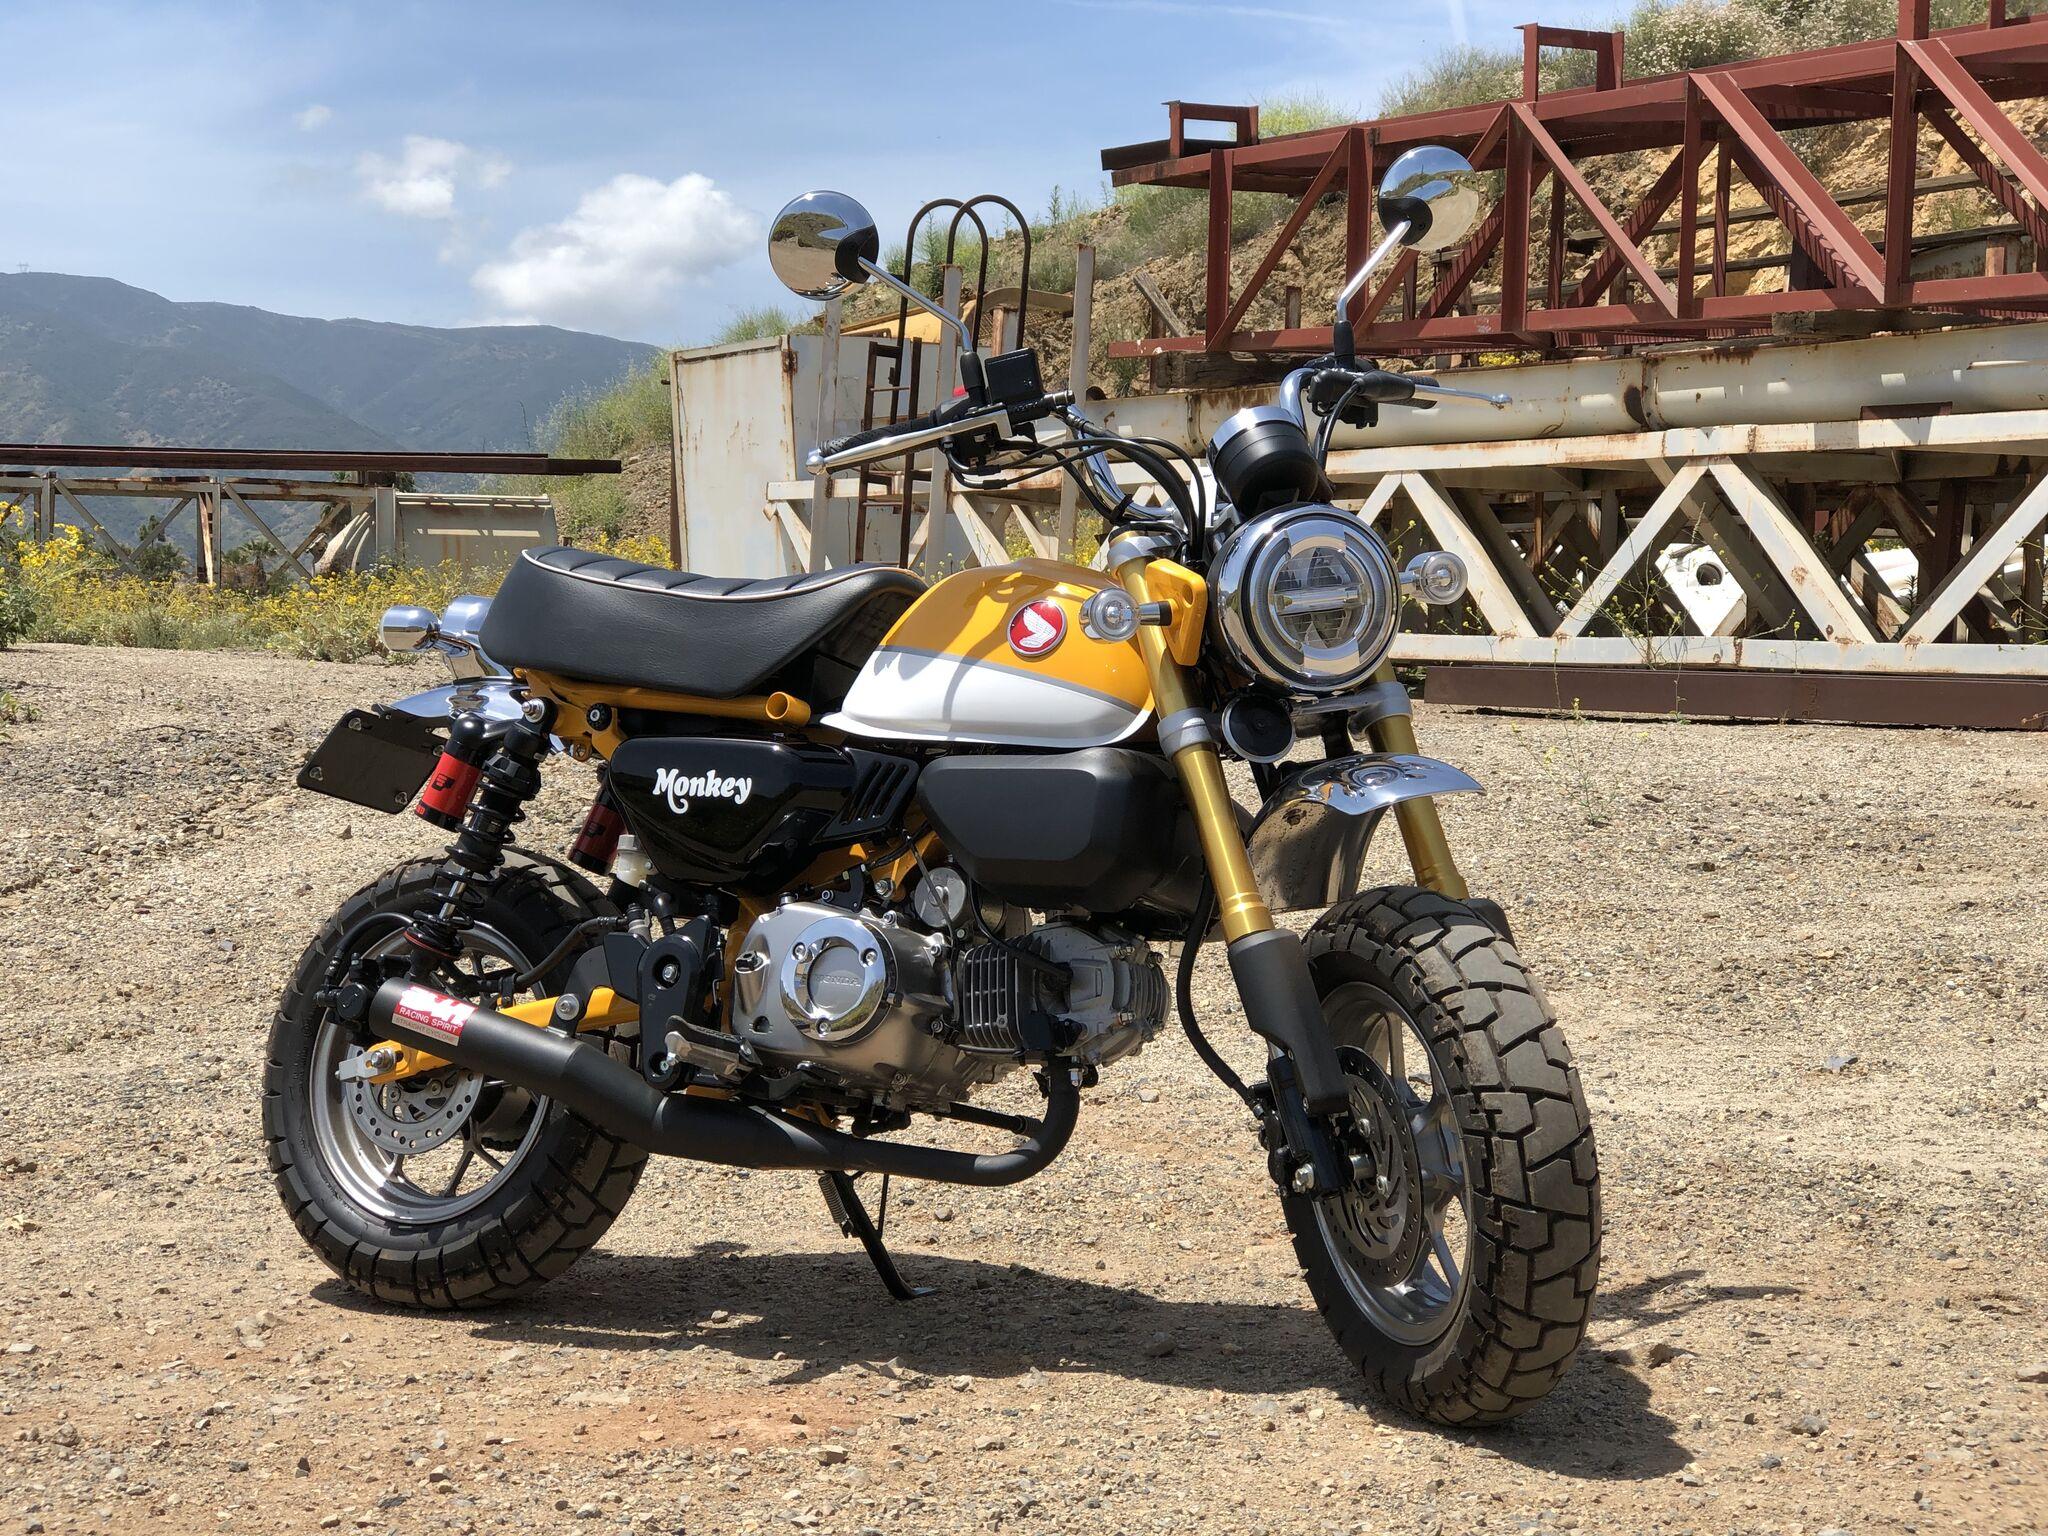 Yoshimura Introduces Honda Monkey Straight Cyclone System